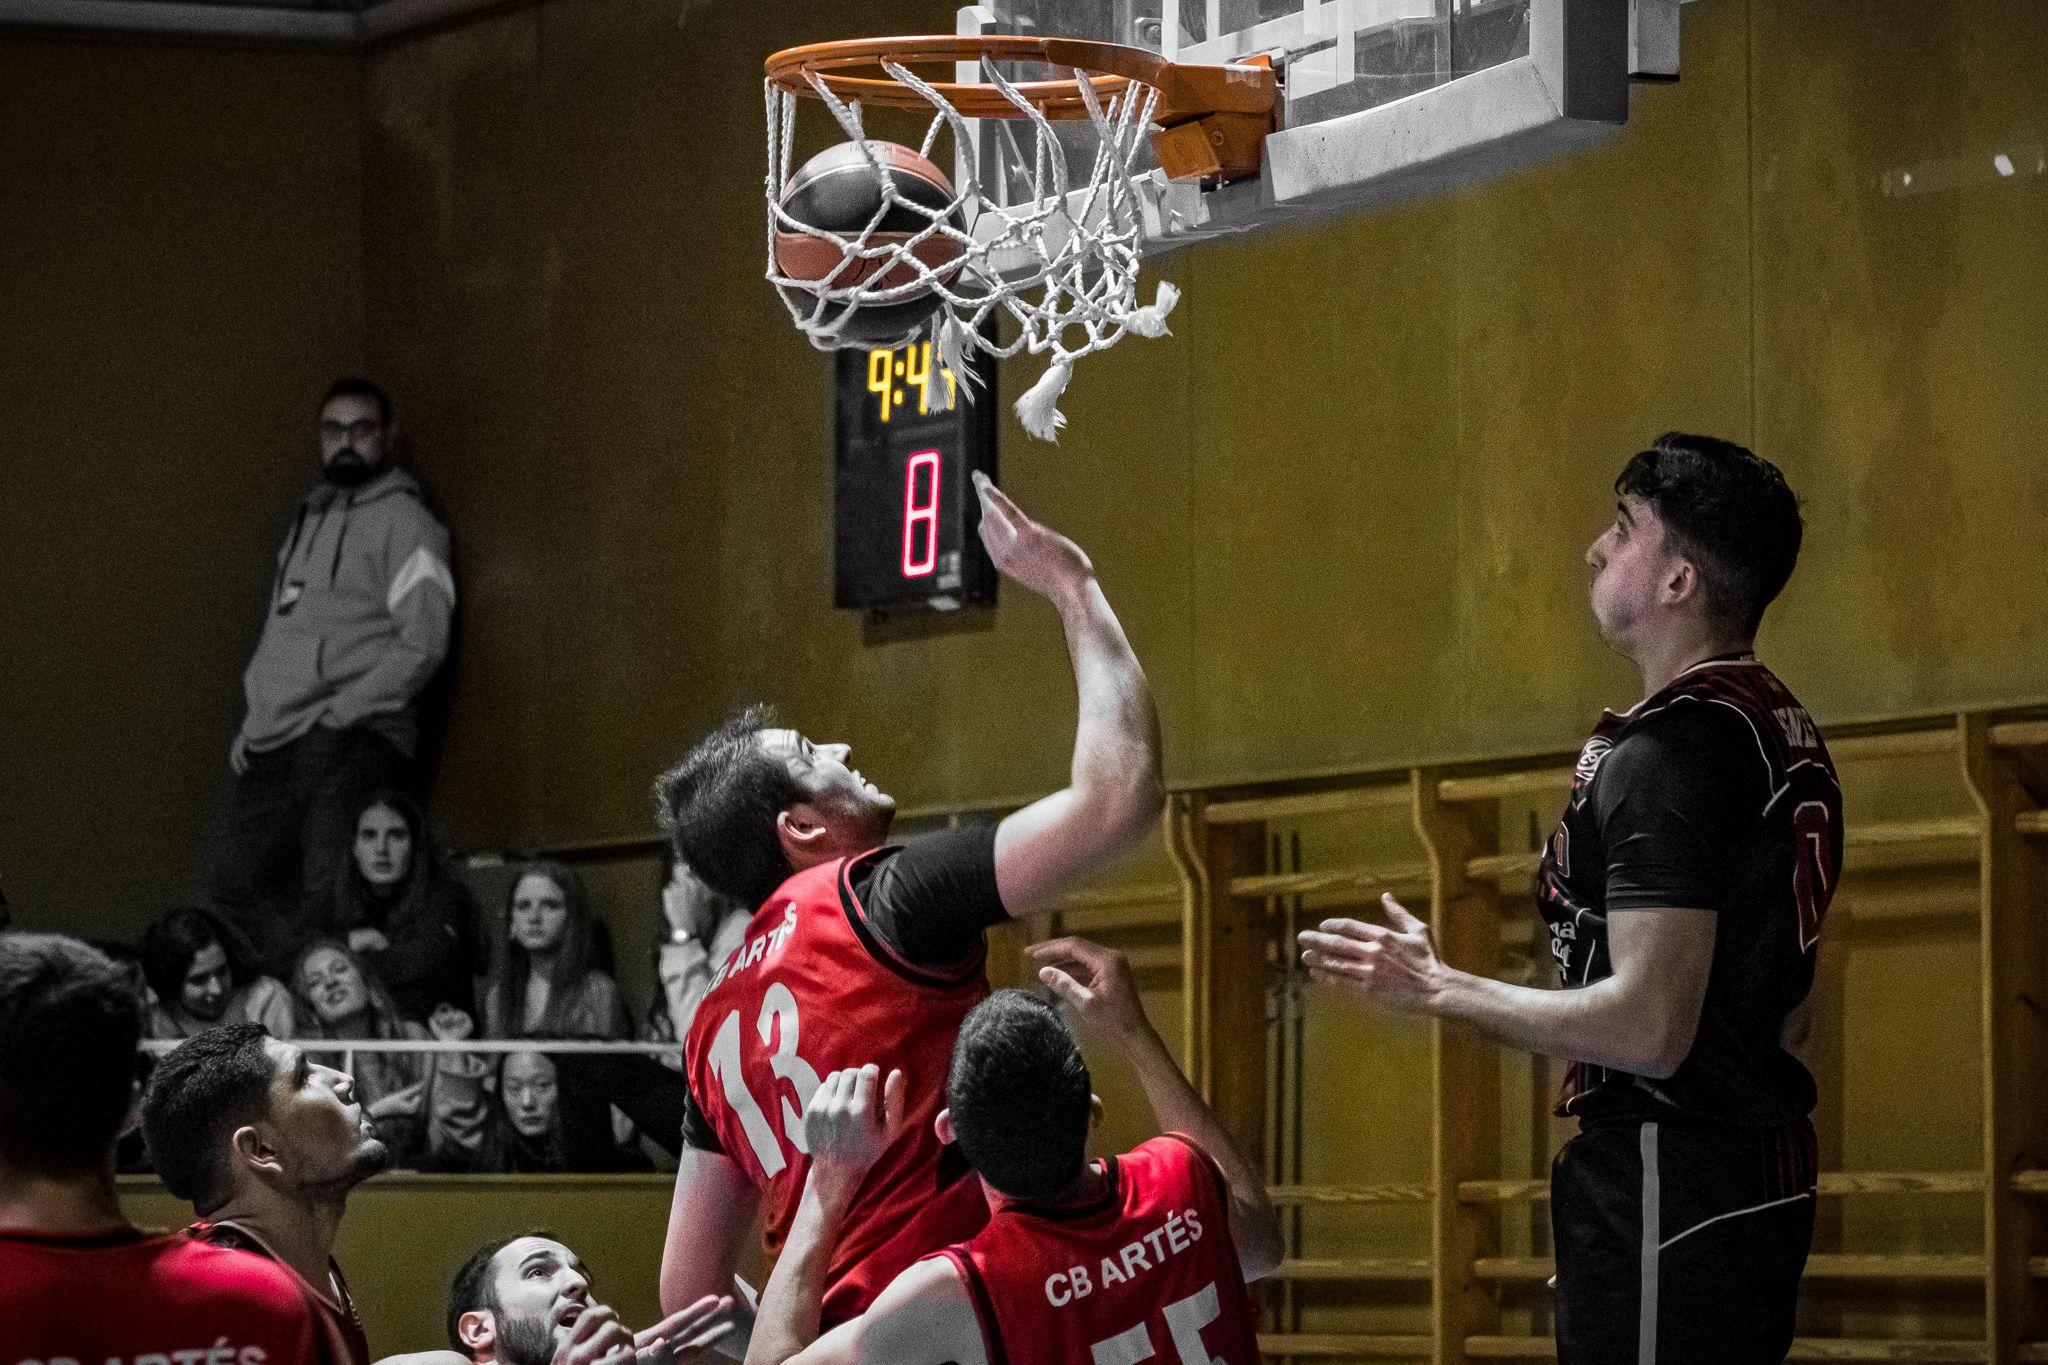 Partit de lliga de bàsquet masculí: UE Sant Cugat FC-CB Artés. FOTO: Ale Gómez